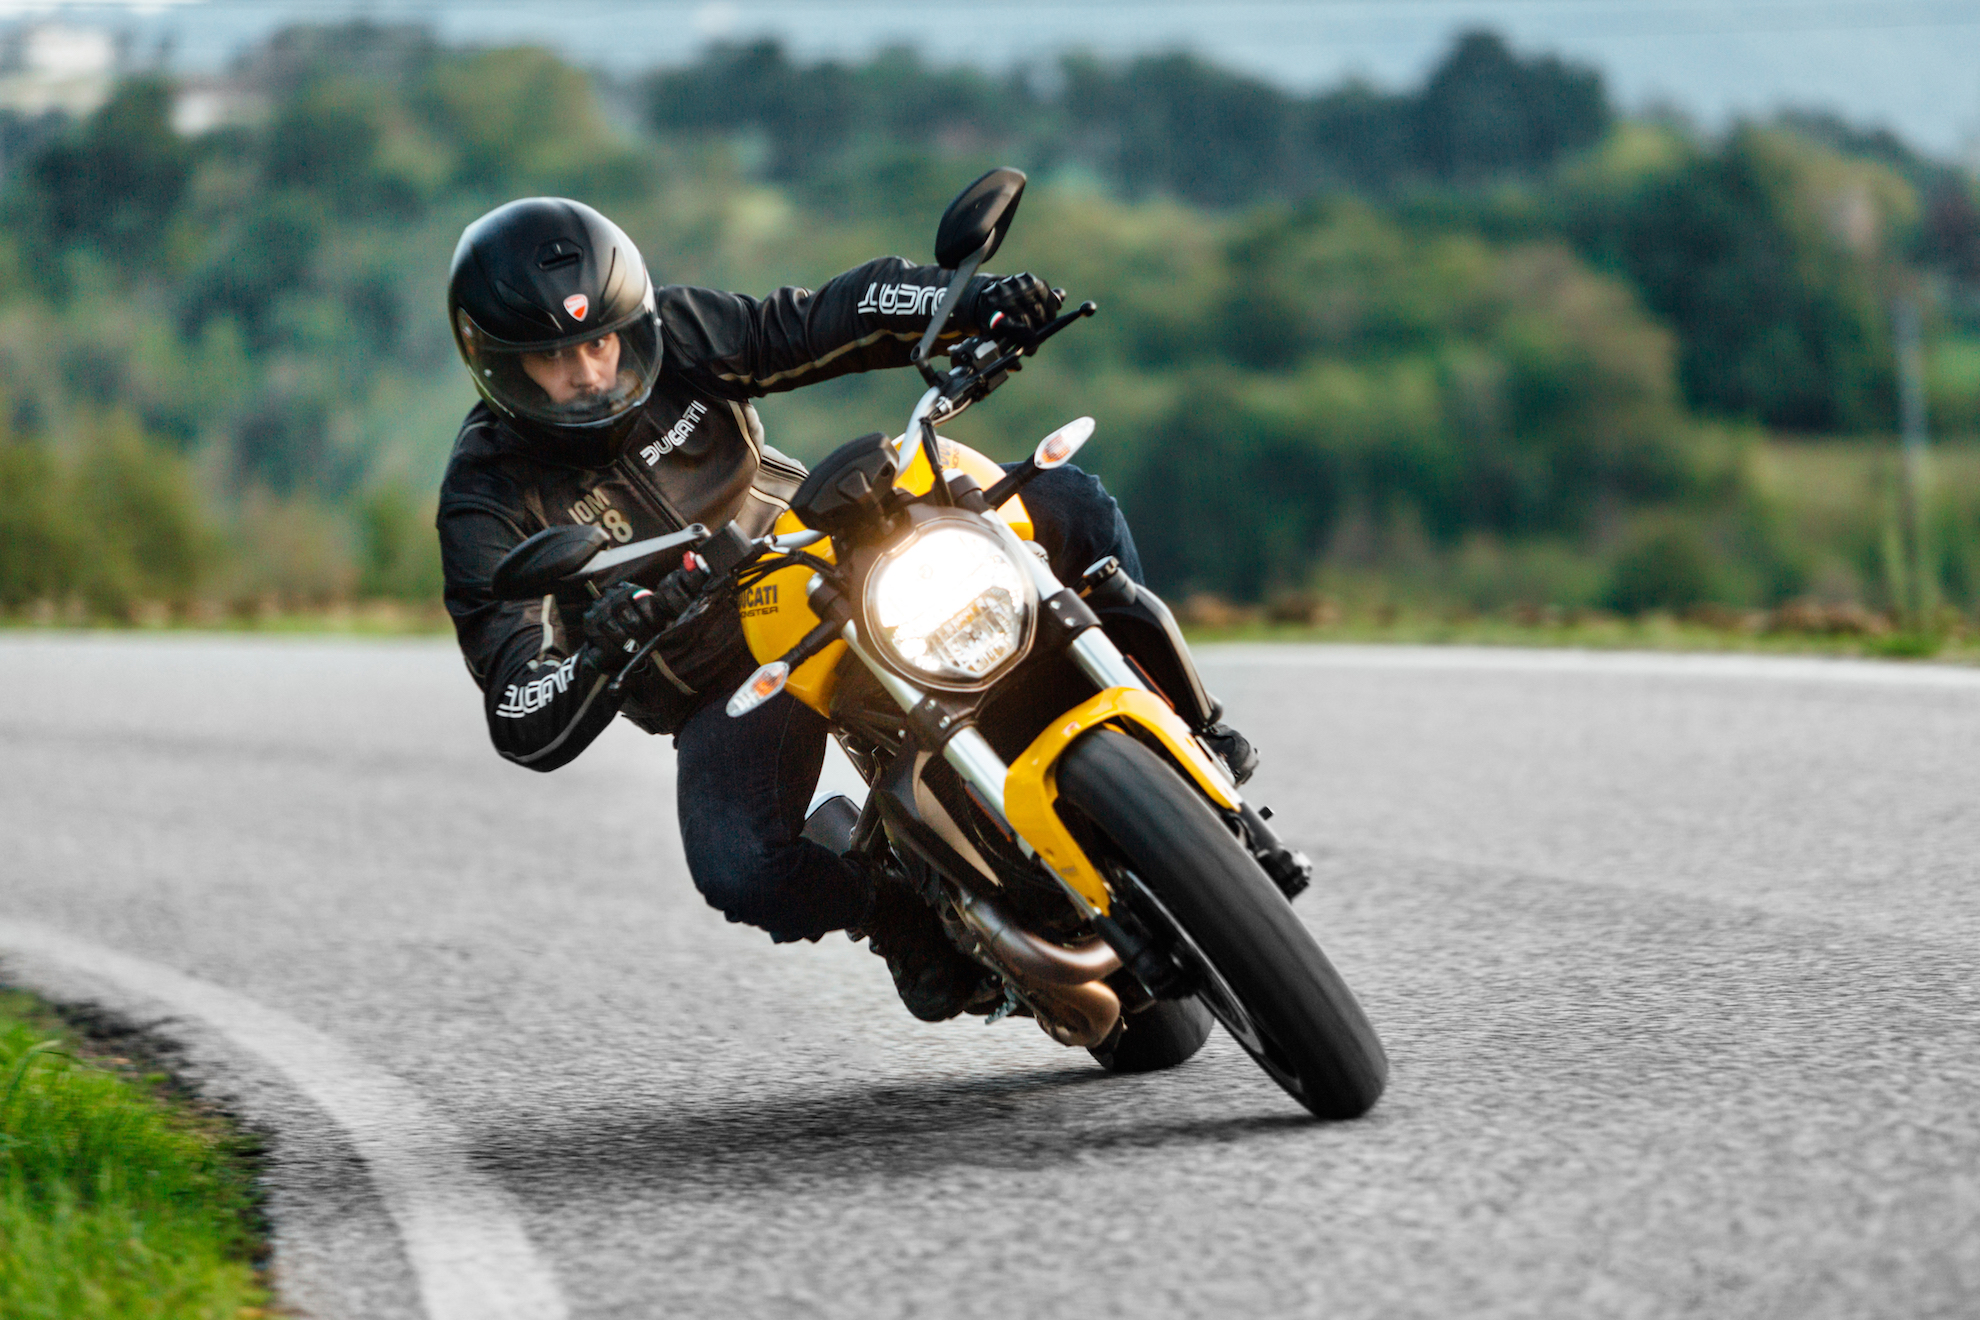 buy or test ride a ducati win motogp passes easy